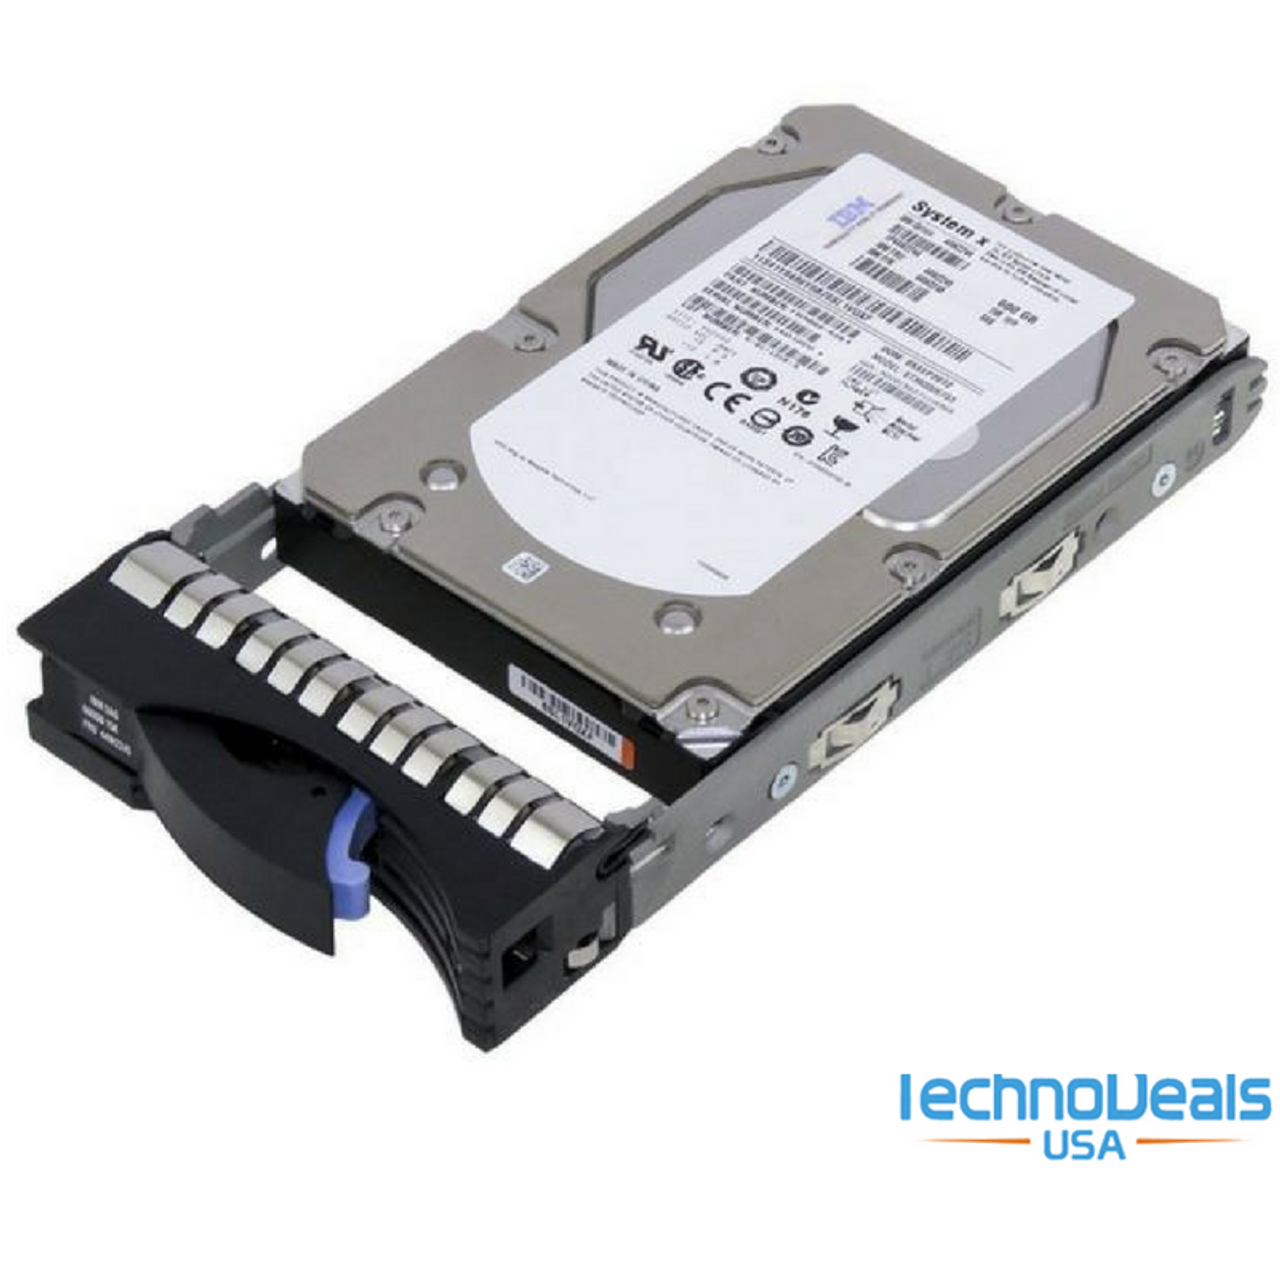 44W2248   IBM 600GB 15K 6GBPS HS SAS Harddrive